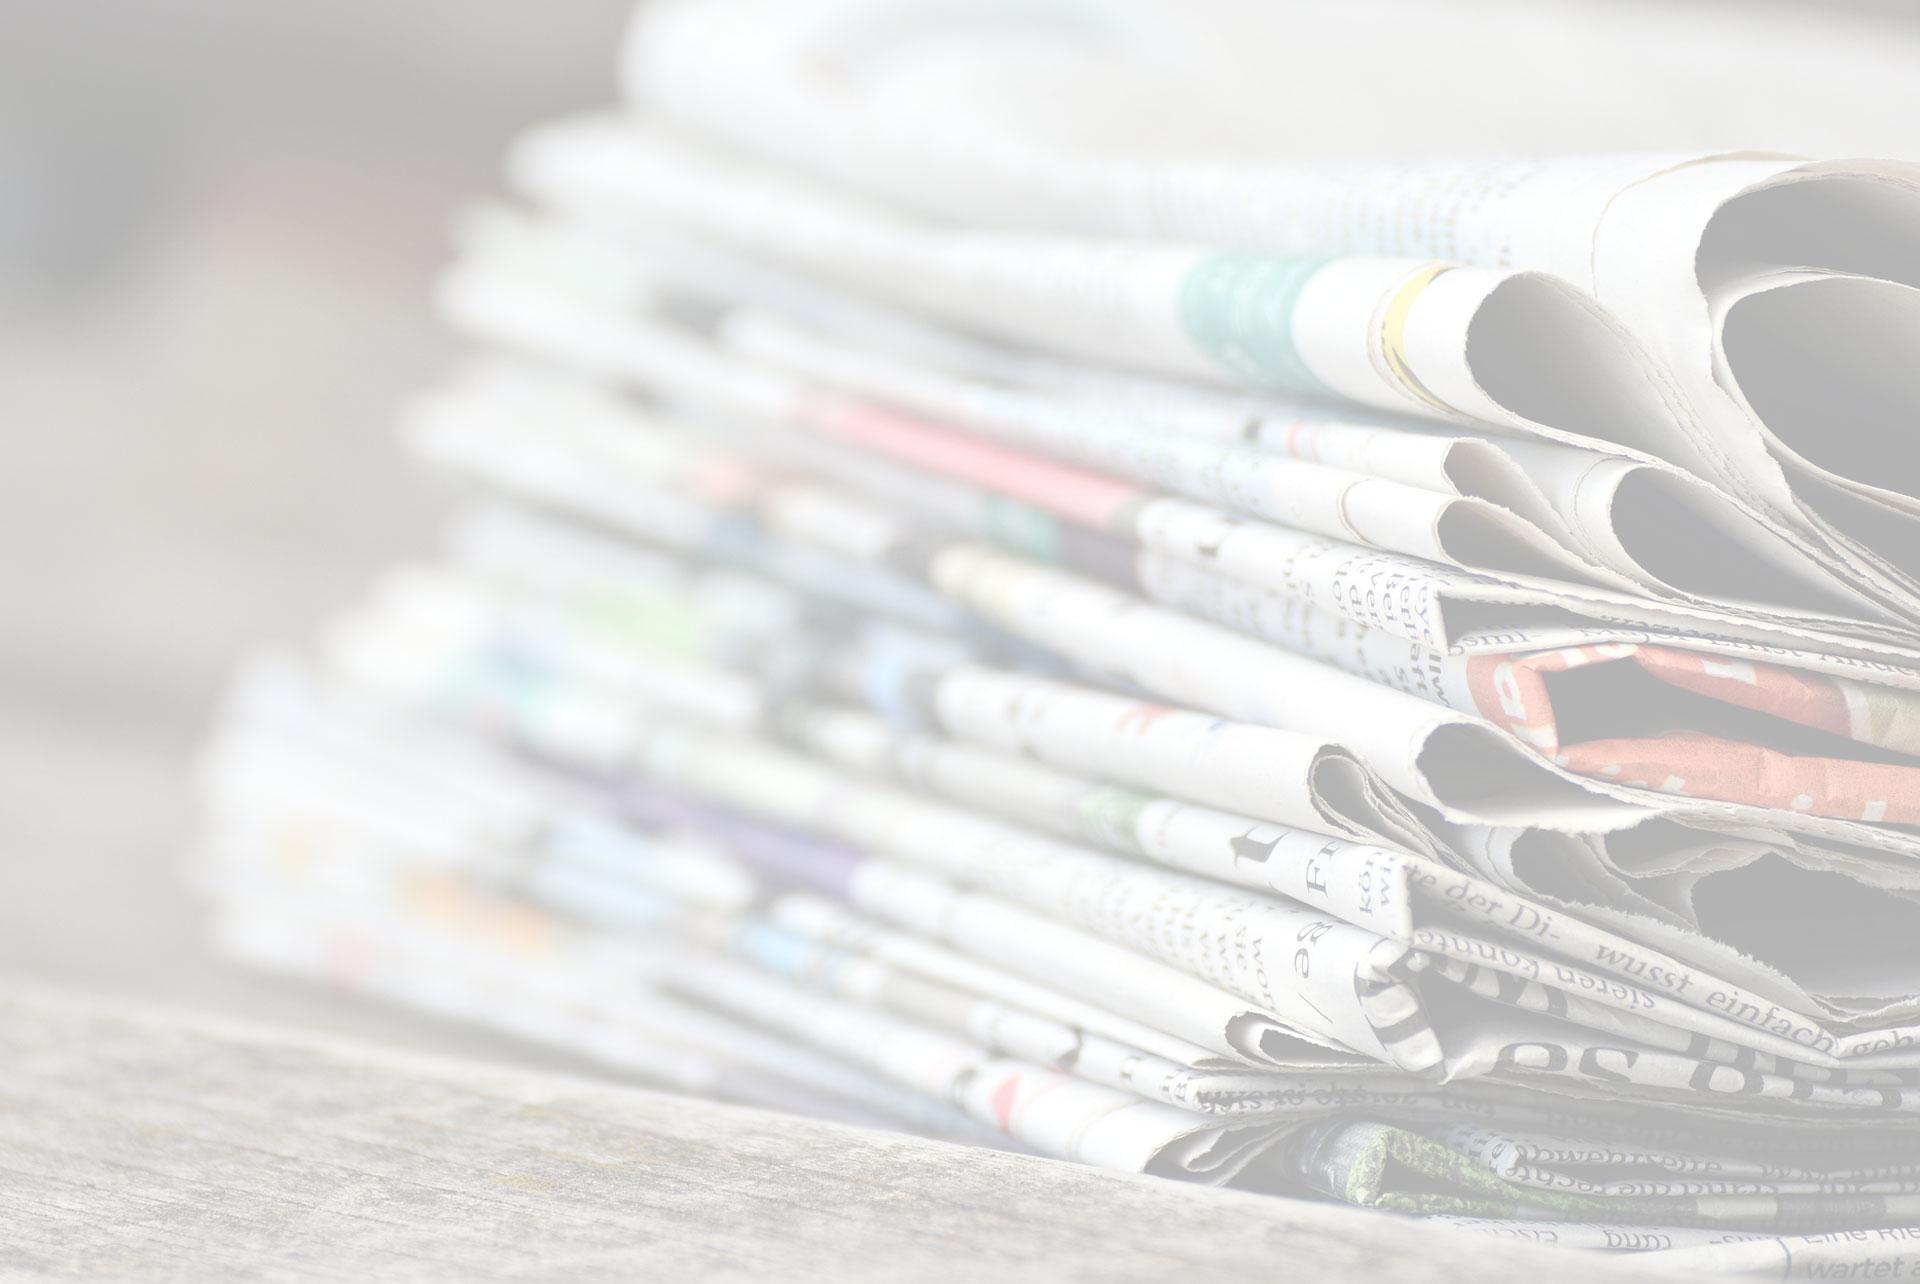 Farmacia Zago